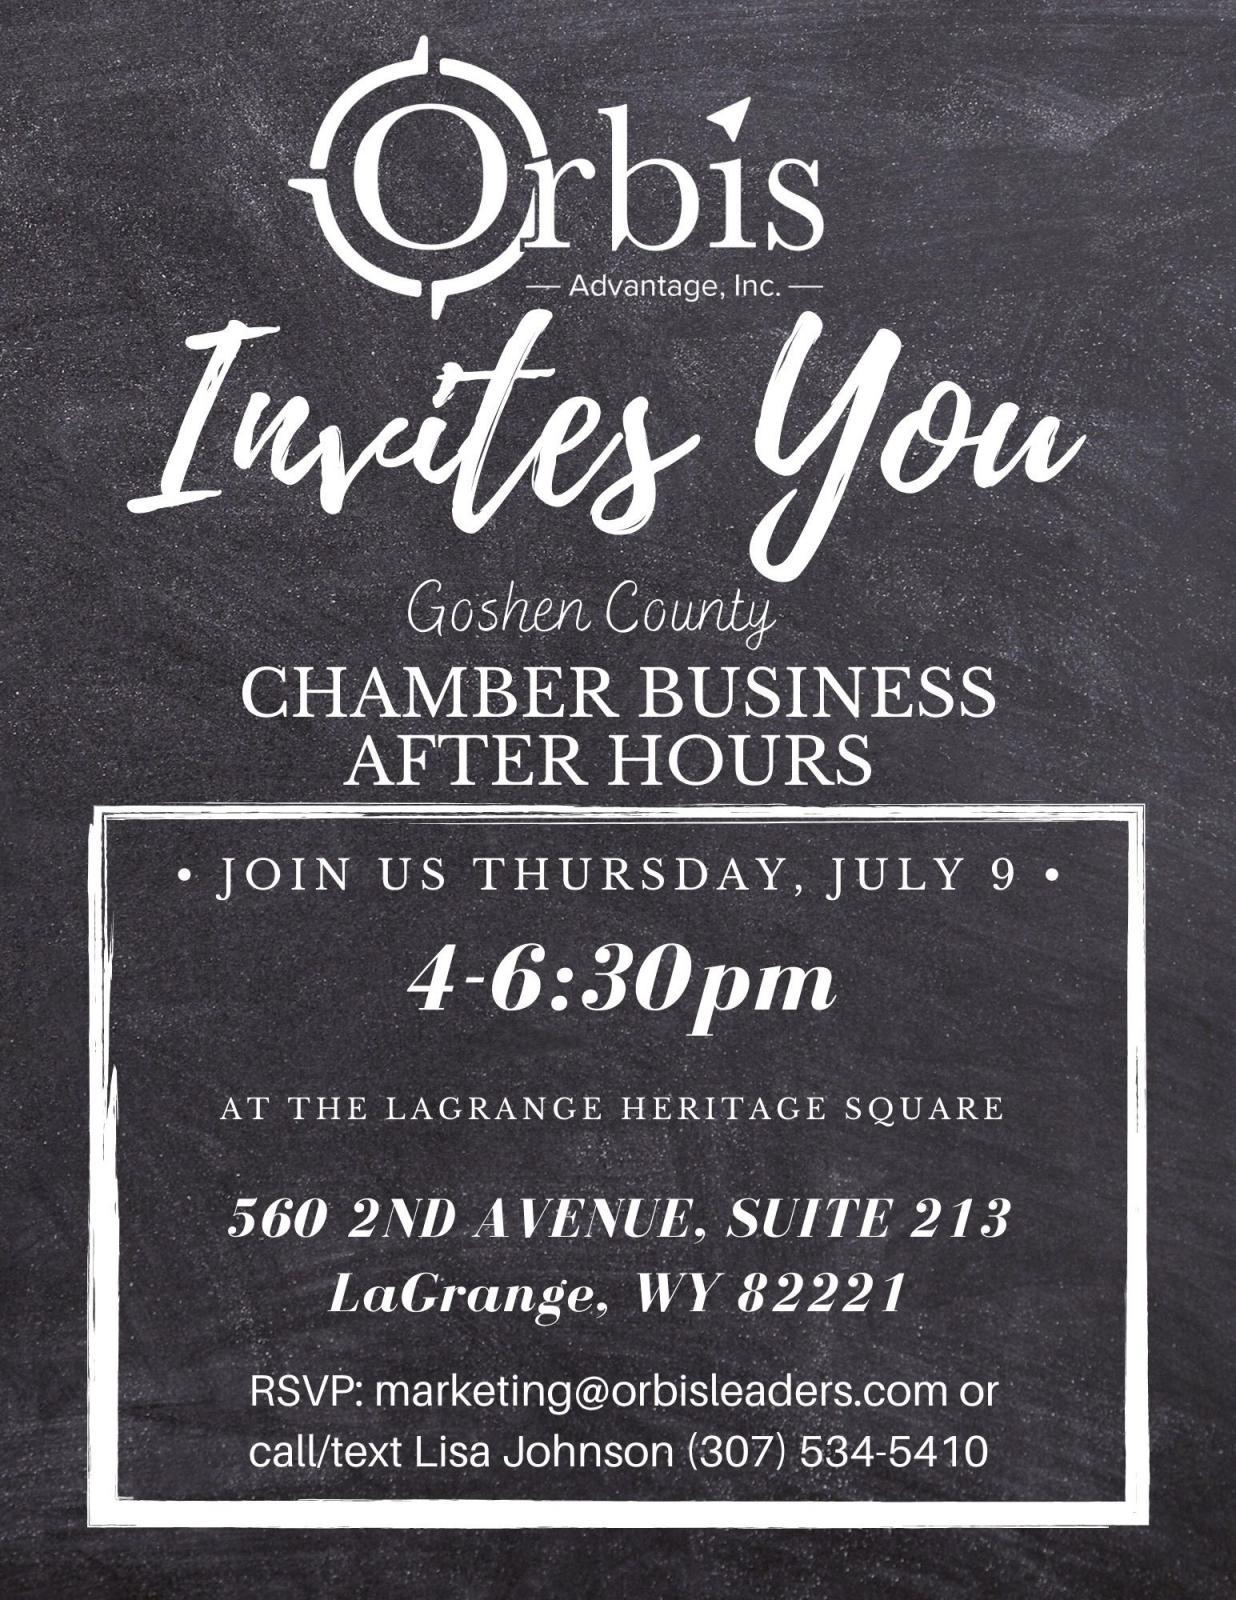 Orbis Advantage, Inc. Business After Hours Photo